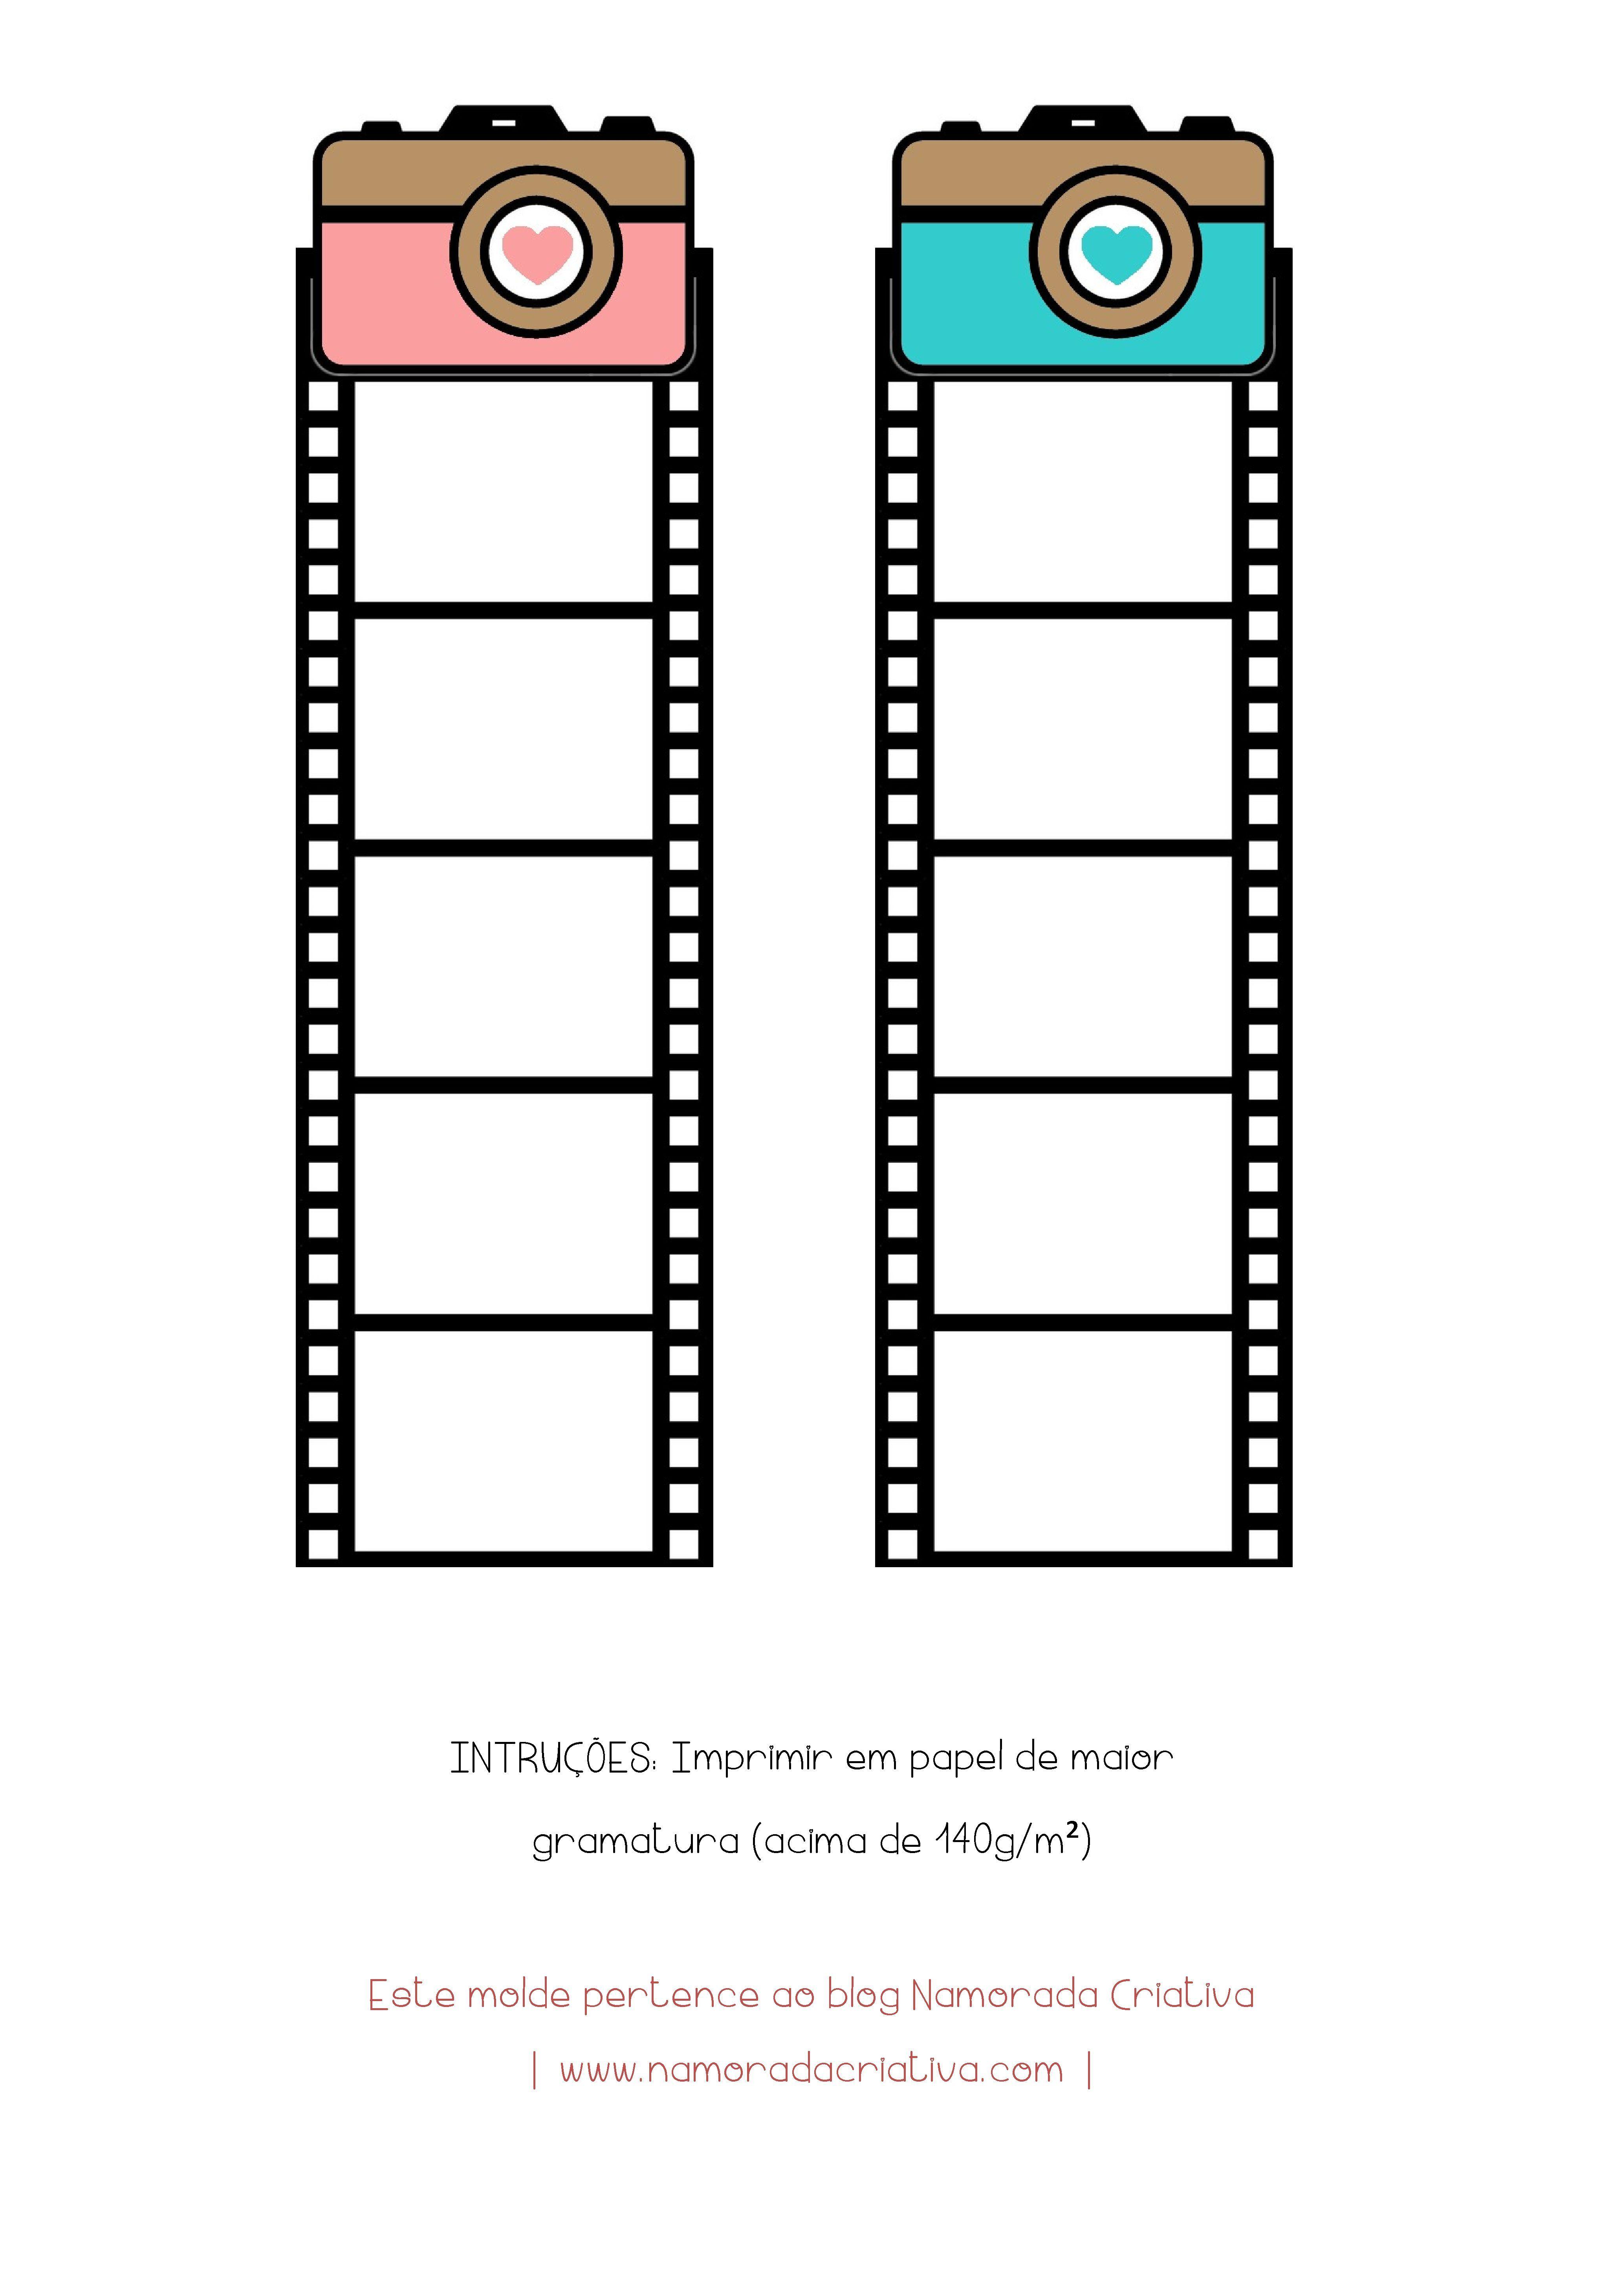 Diy Marca Paginas Para O Casal Atividade Imprimir Sobres